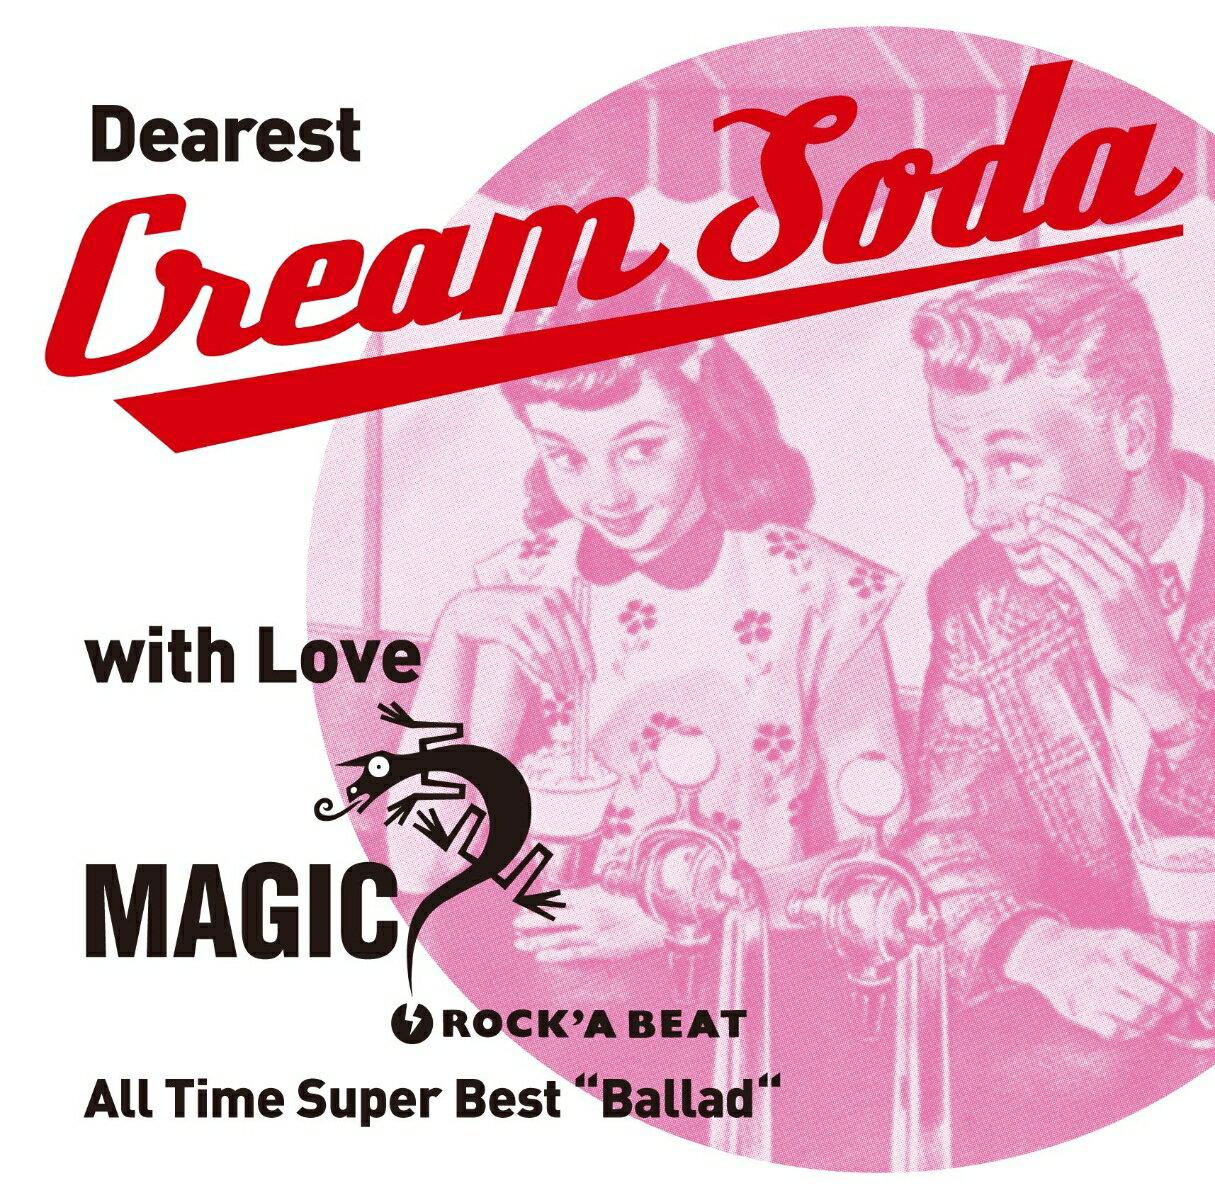 "〜 Dearest Cream Soda with love MAGIC 〜 All Time Super Best ""Ballad"" [ MAGIC ]"